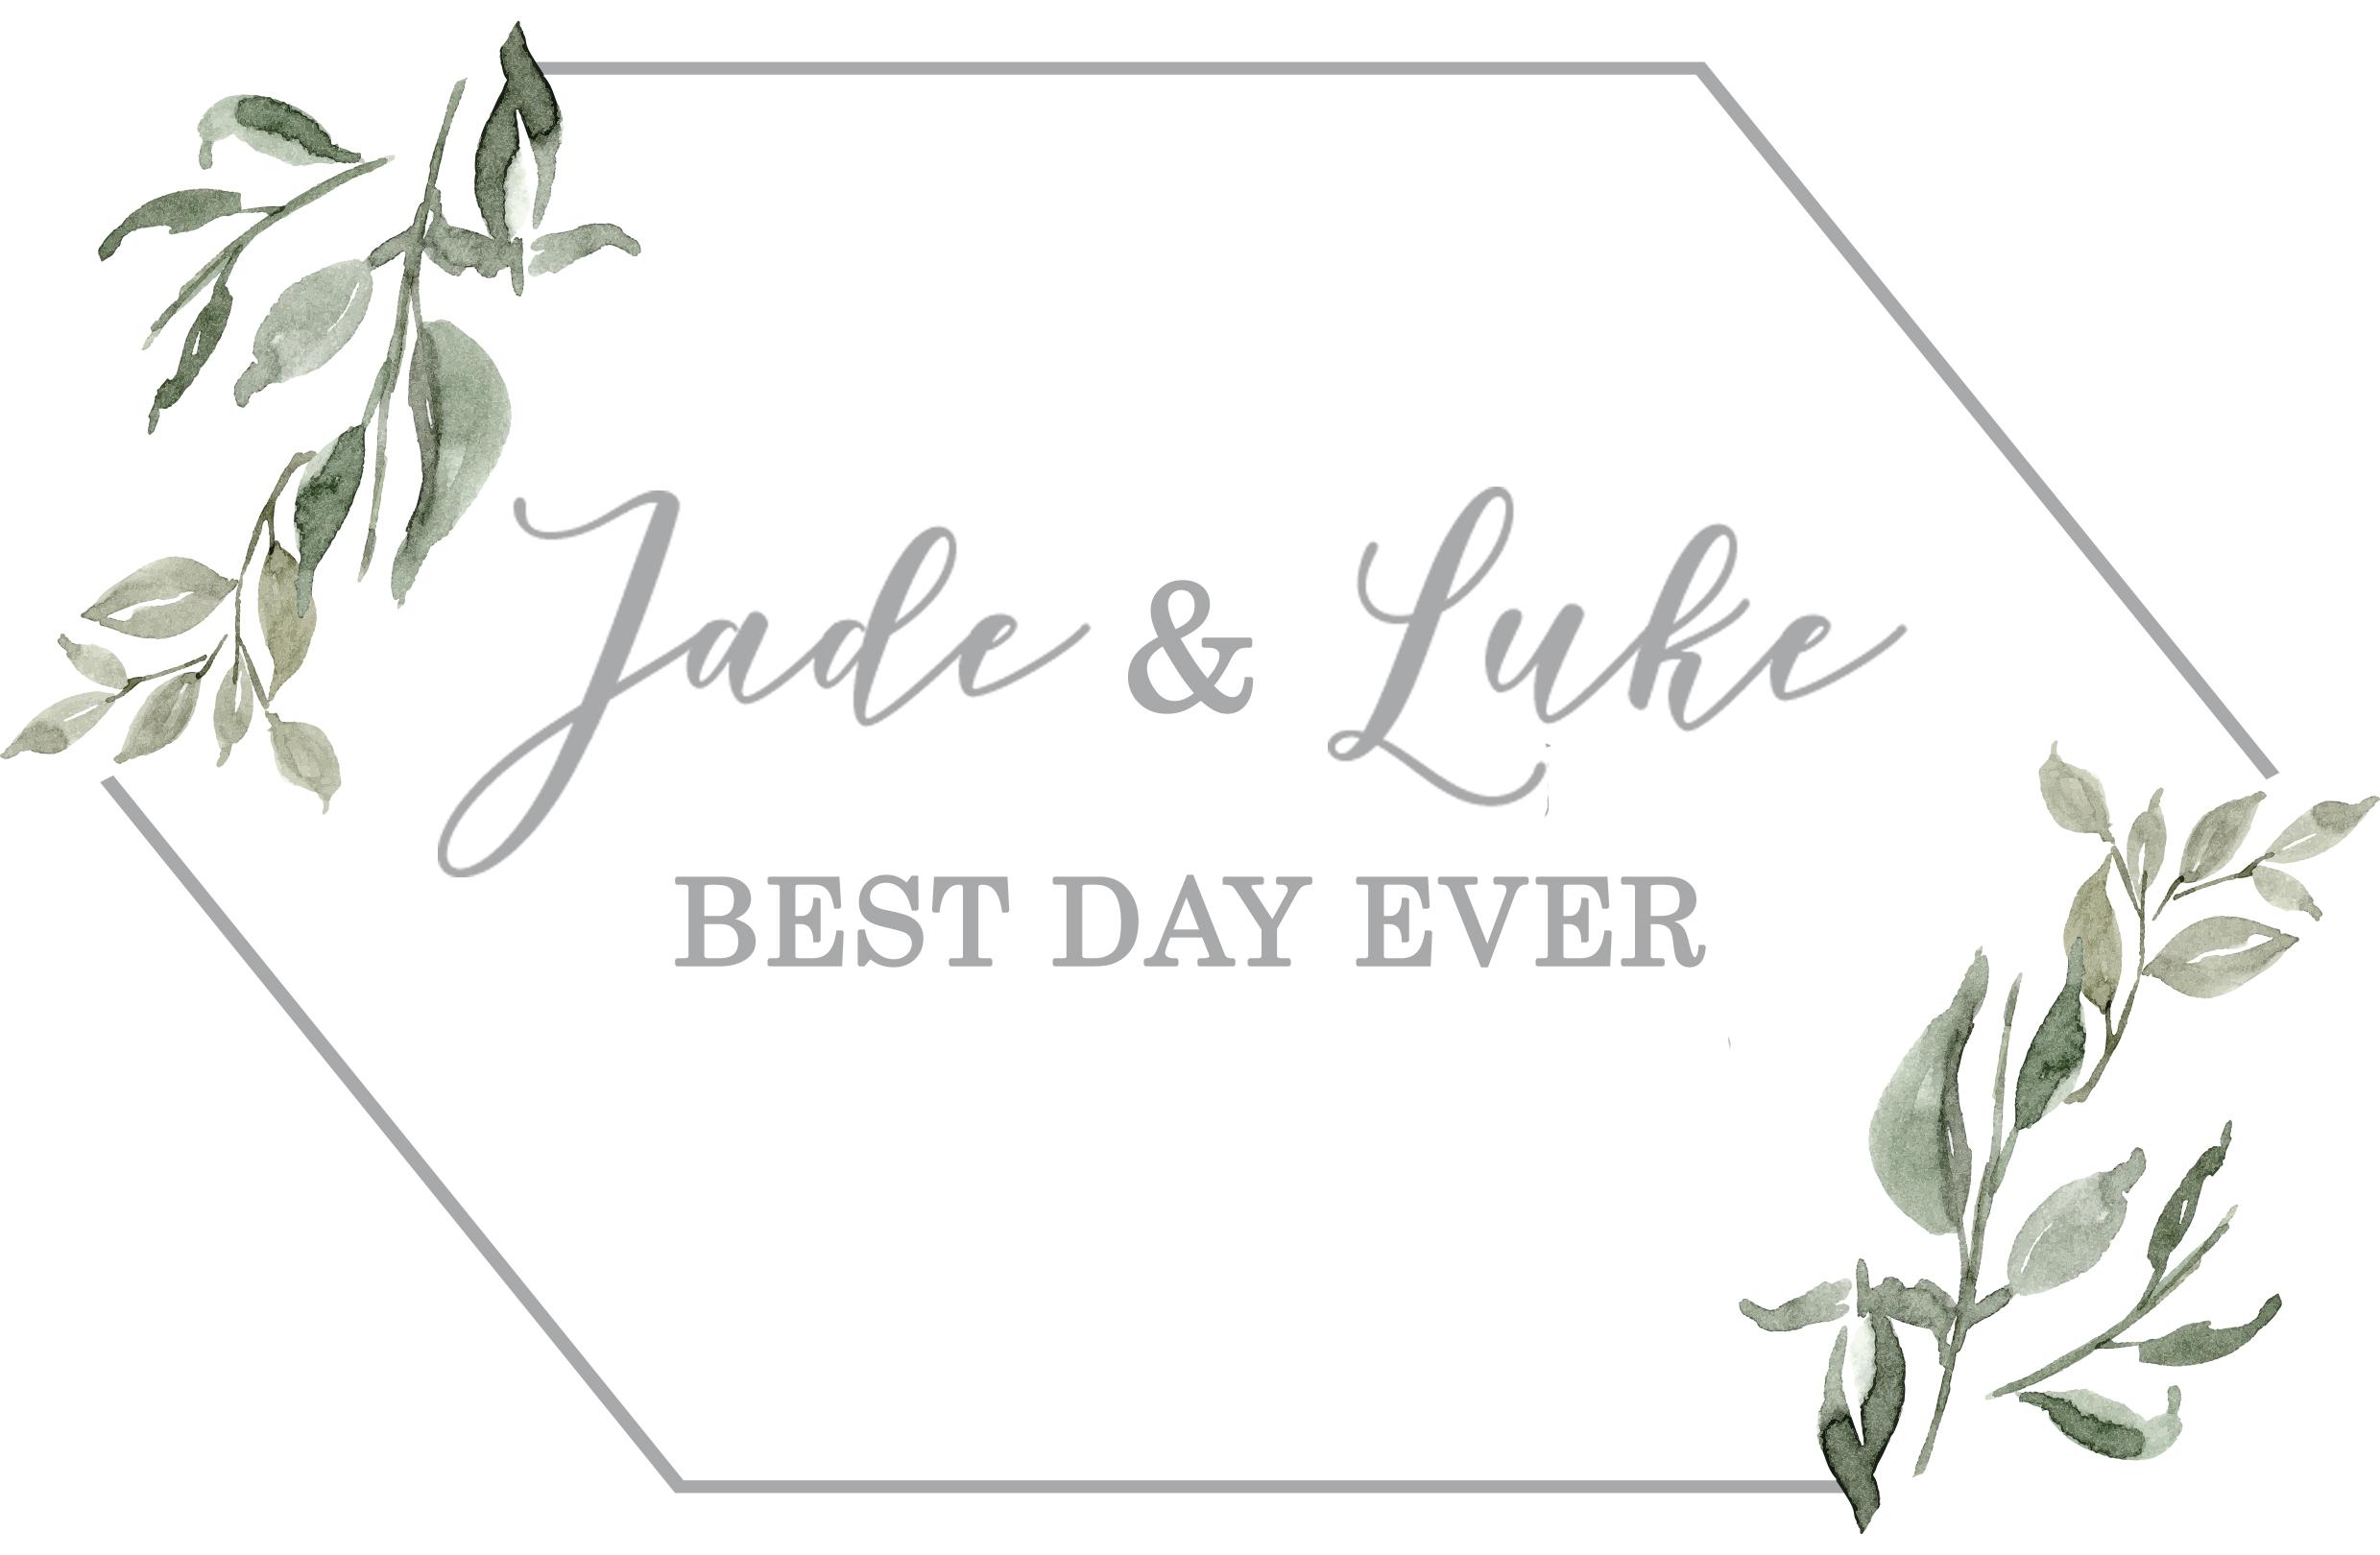 Jade and Luke WEB LOGO.jpg